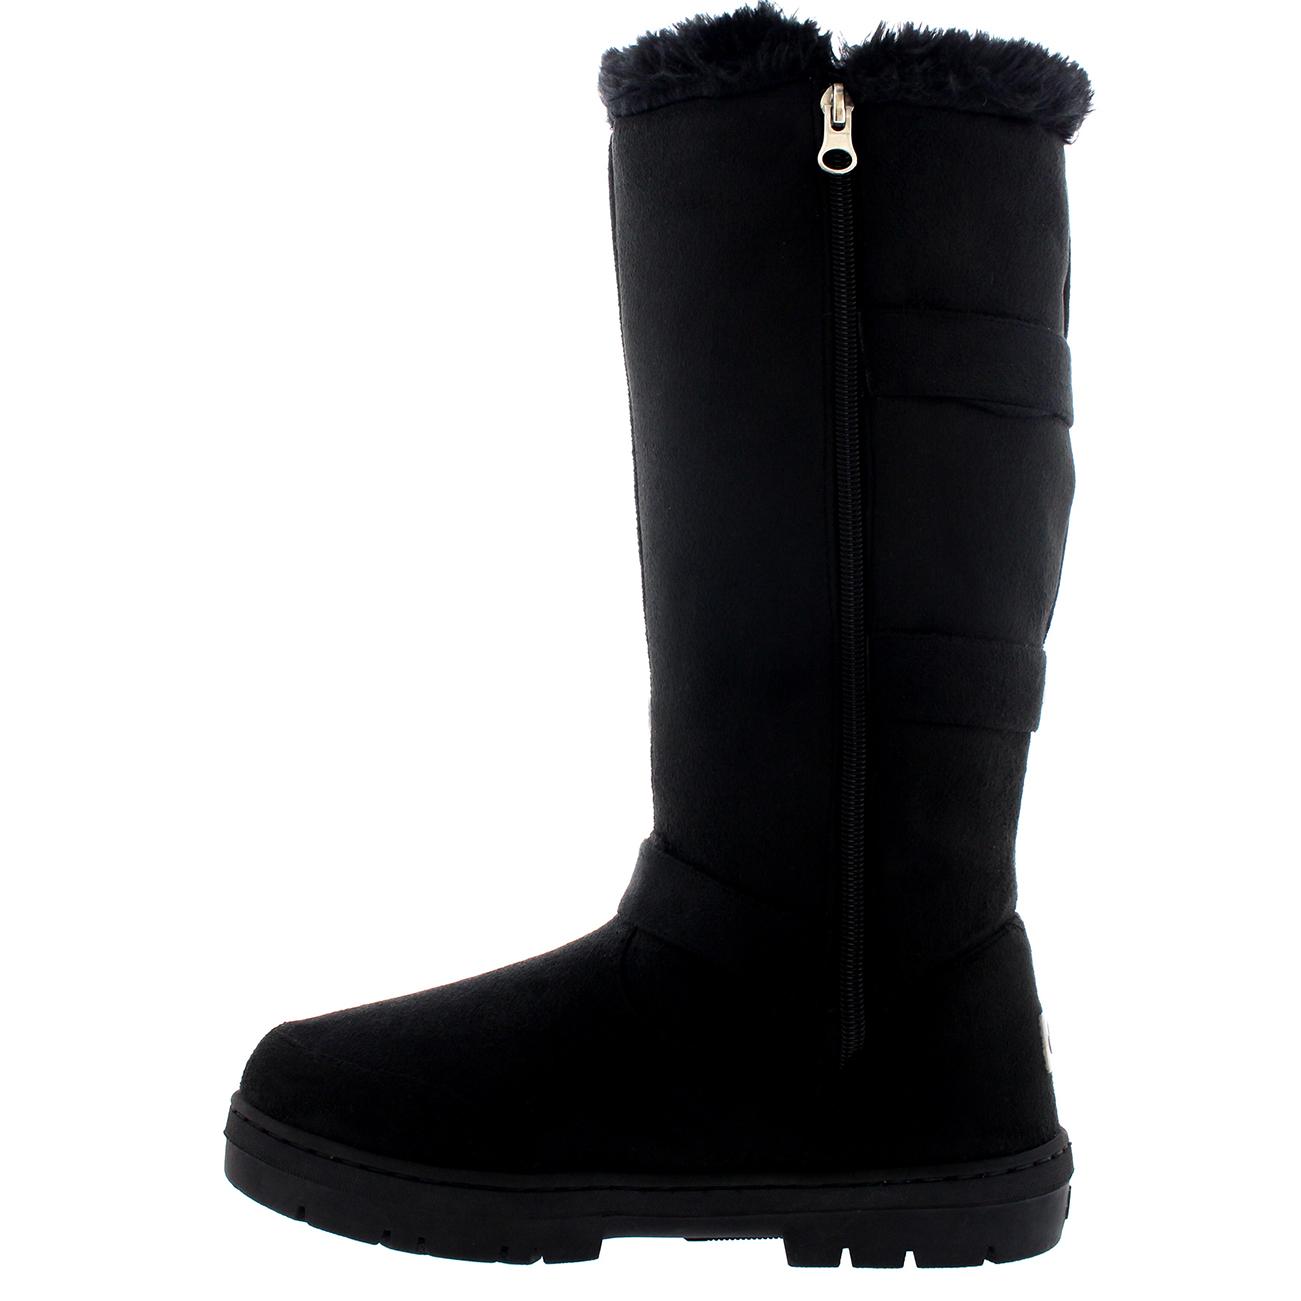 Womens Knee High Fur Lined Snow Waterproof Hard Sole